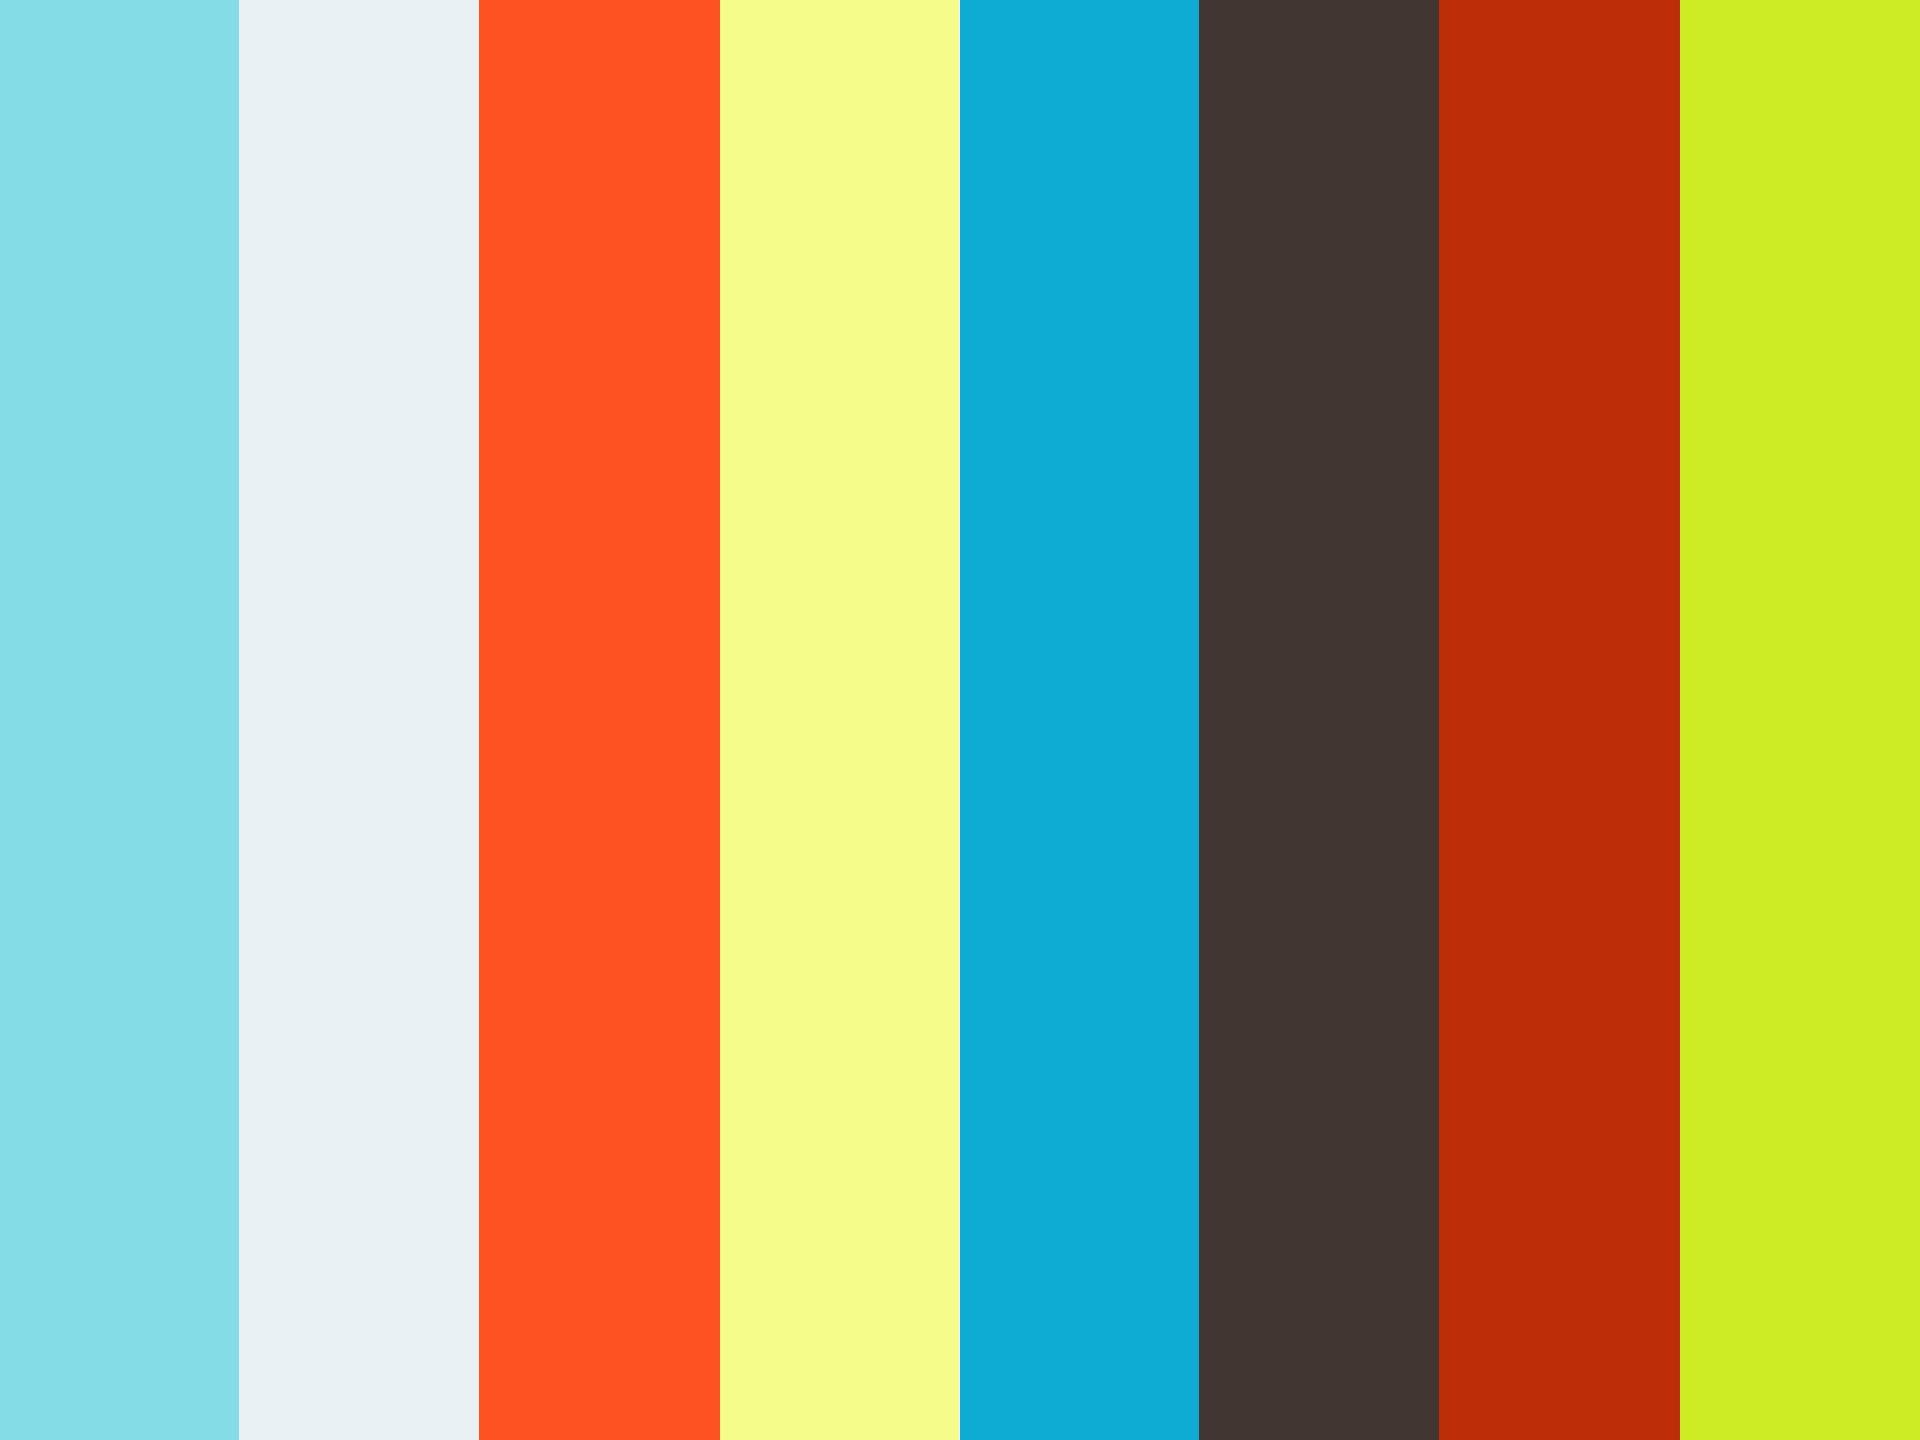 edoardo ballerini romeo must dieedoardo ballerini, эдоардо баллерини, edoardo ballerini wikipedia, edoardo ballerini married, edoardo ballerini audio books, edoardo ballerini net worth, edoardo ballerini gay, edoardo ballerini imdb, edoardo ballerini boardwalk empire, edoardo ballerini narrator, edoardo ballerini movies, edoardo ballerini the pest, edoardo ballerini girlfriend, edoardo ballerini facebook, edoardo ballerini 24, edoardo ballerini forever, edoardo ballerini romeo must die, edoardo ballerini shirtless, edoardo ballerini biography, edoardo ballerini genevieve